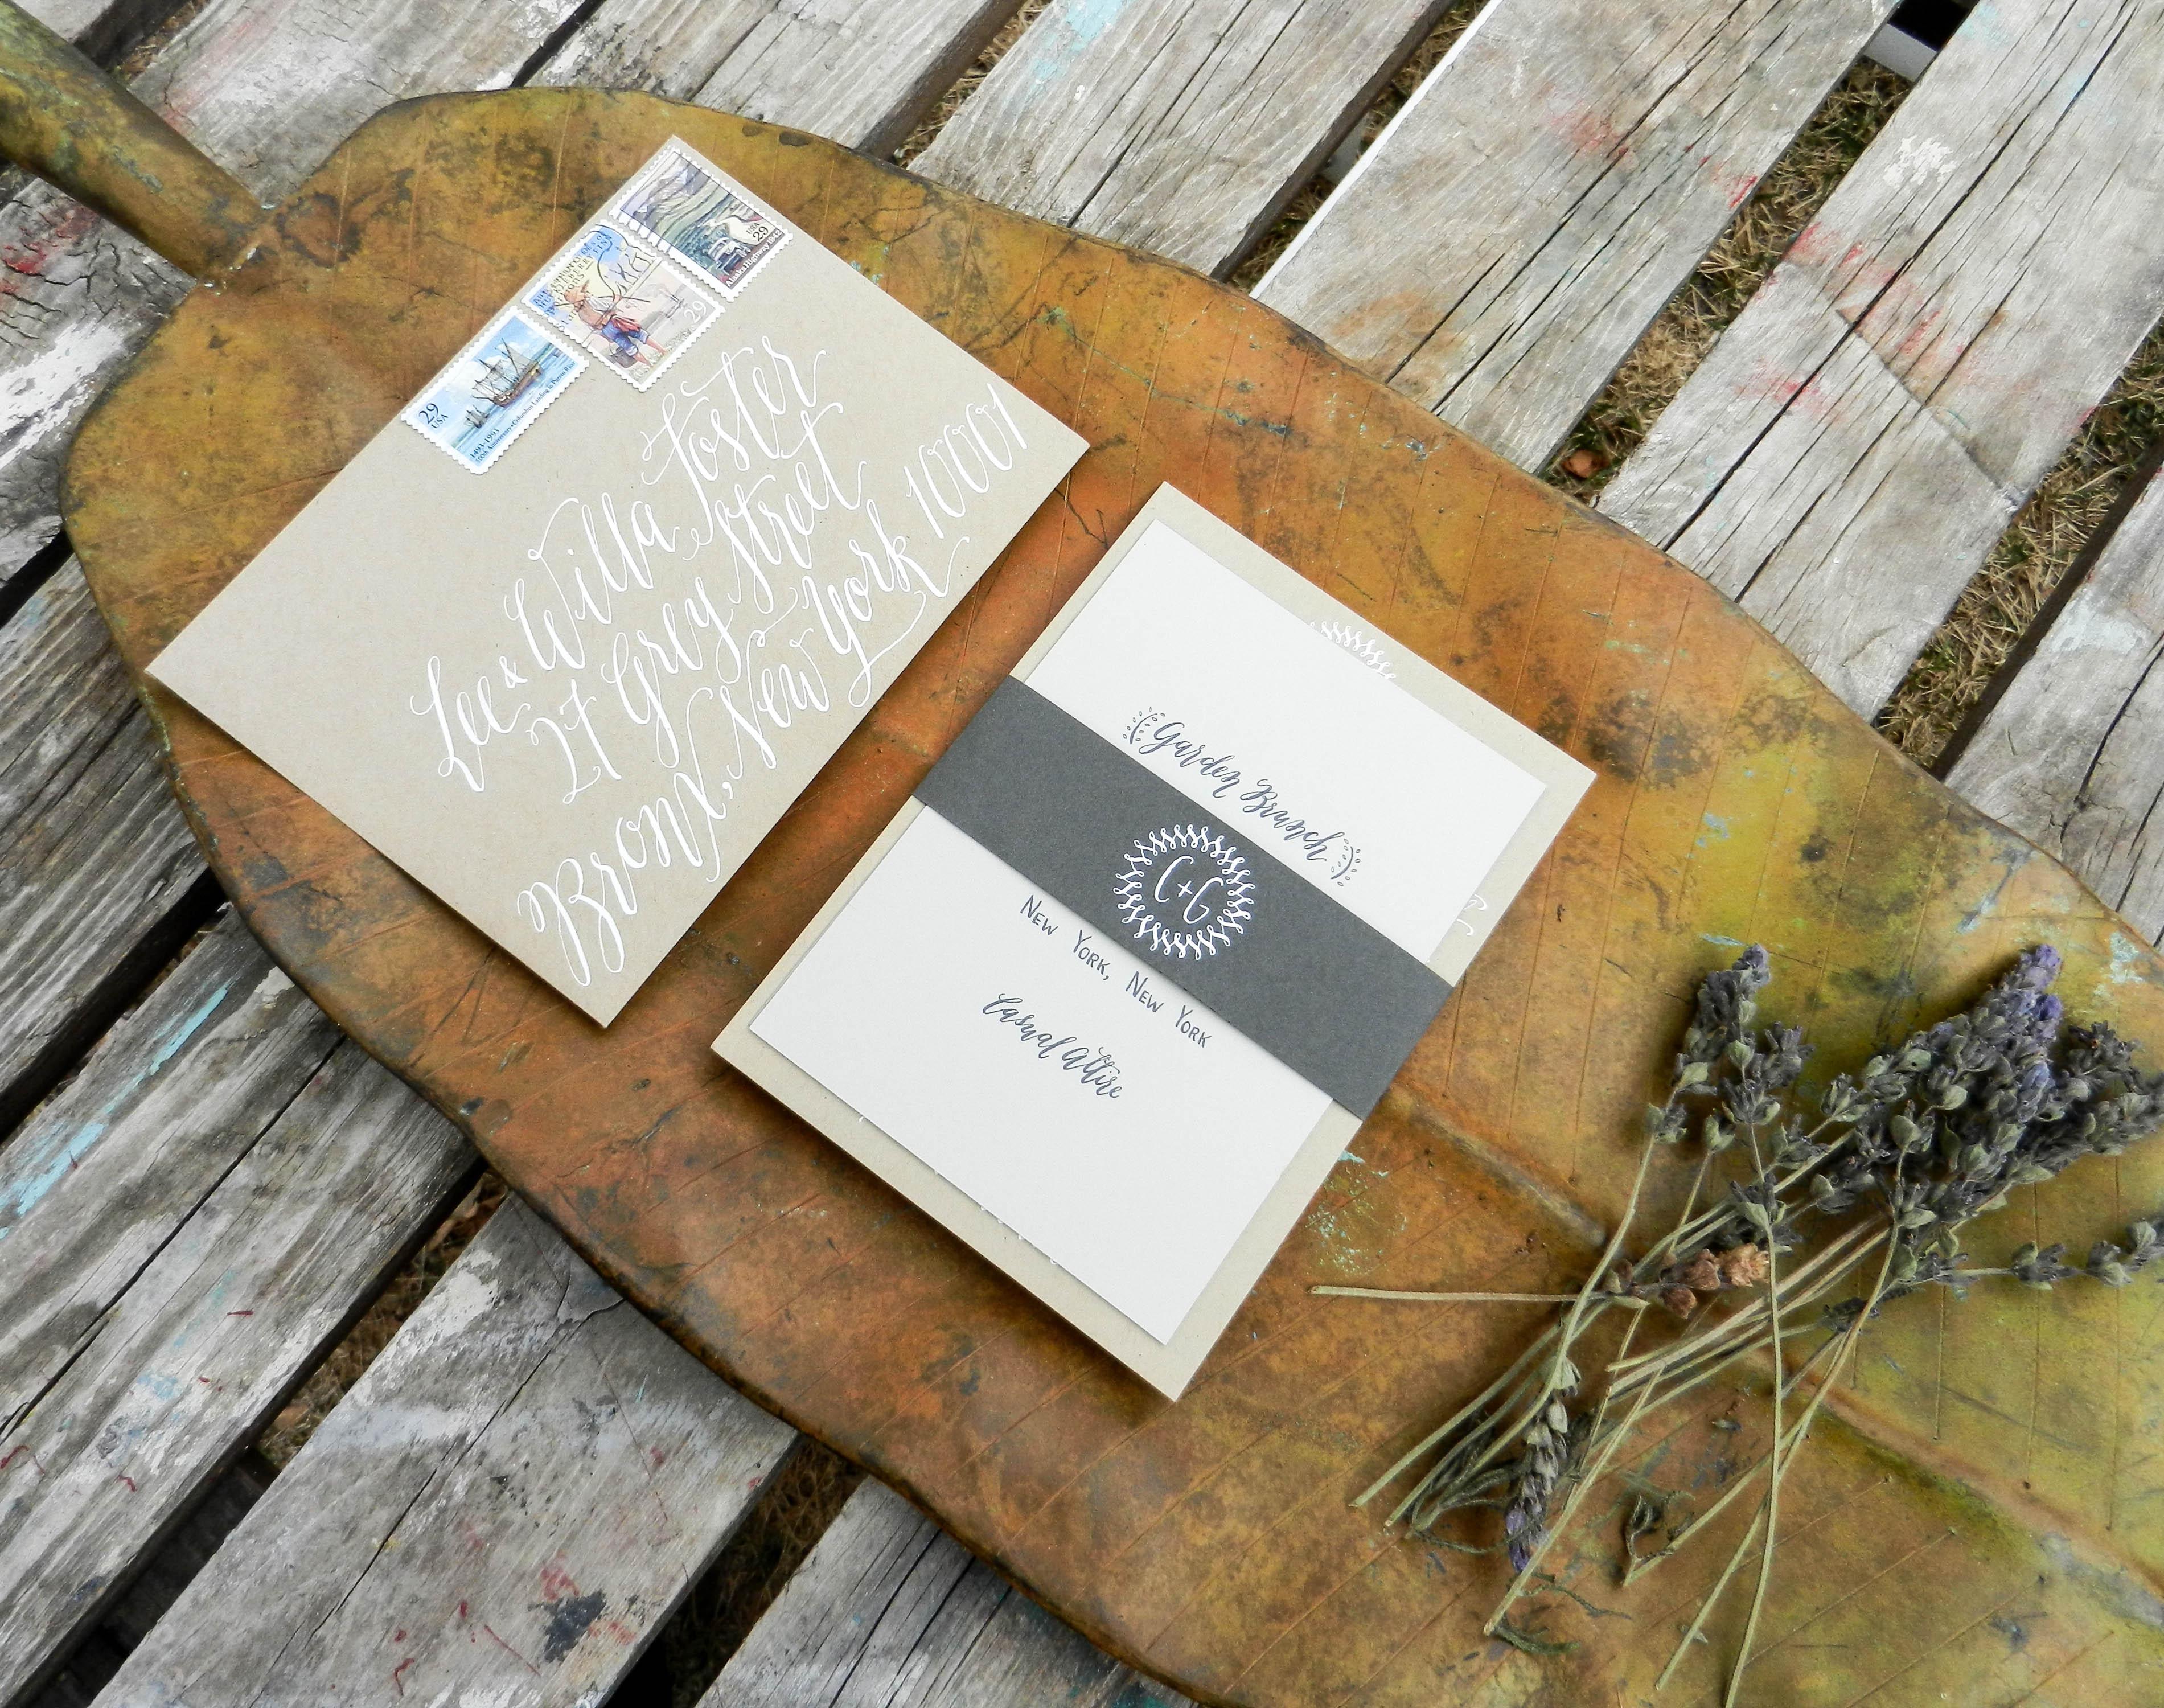 Kaitlin Style Calligraphy on Handwritten Invitations | The Postman's Knock